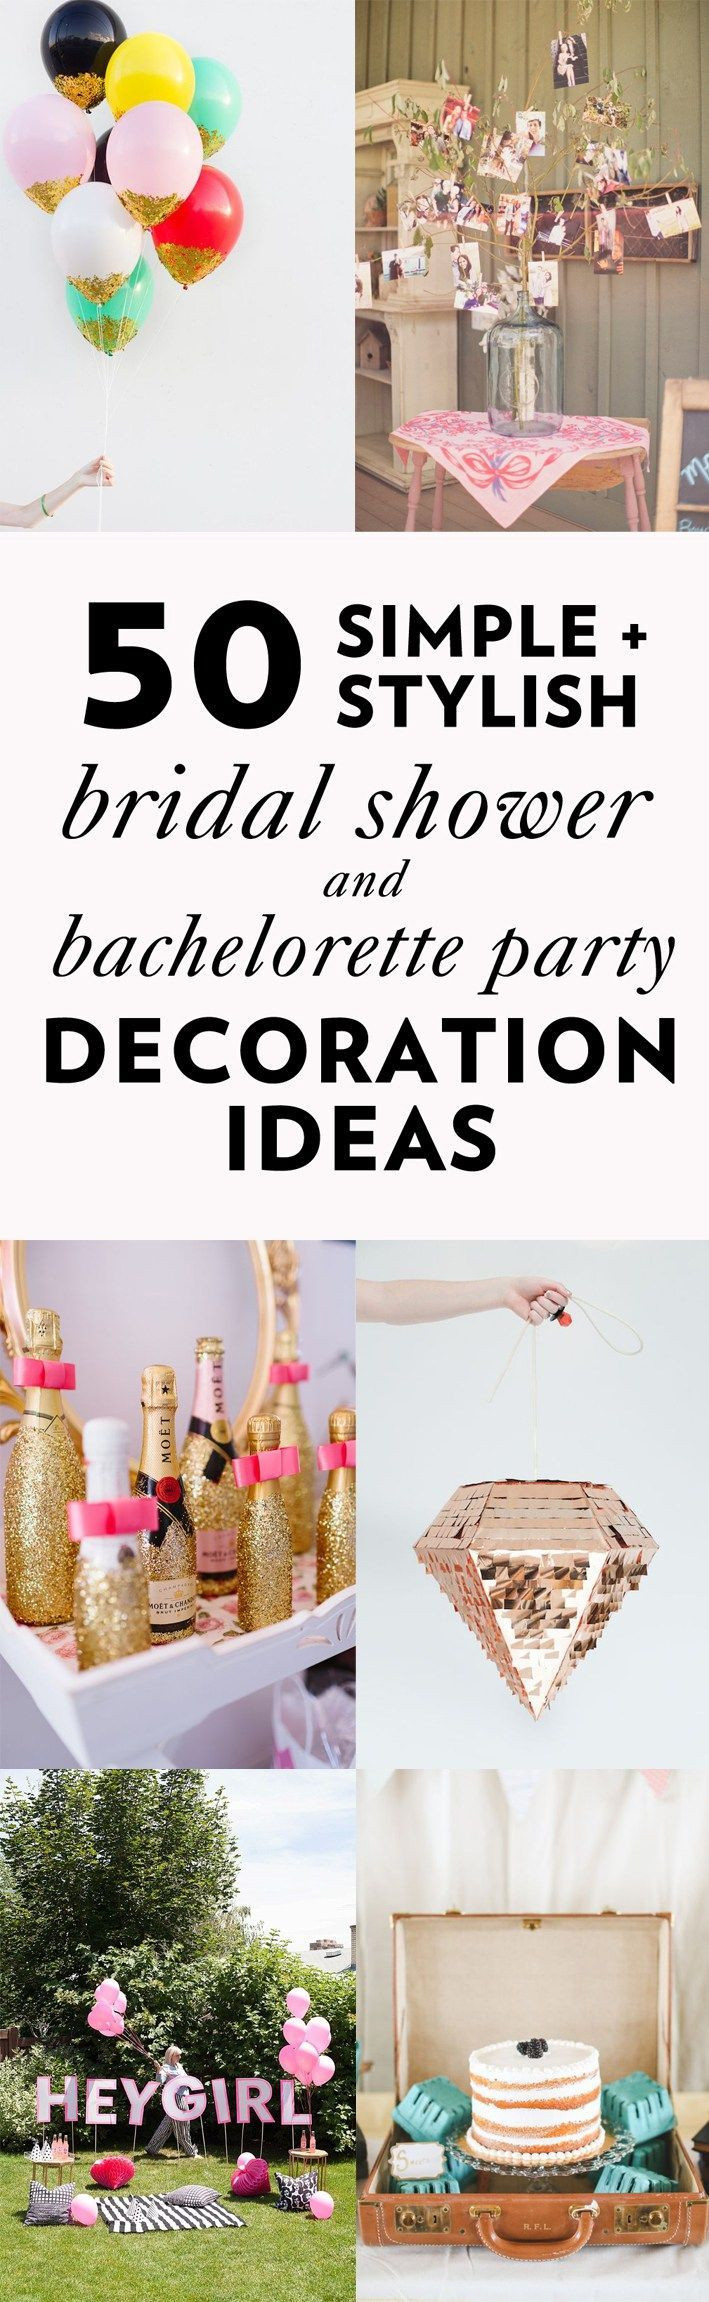 DIY Bachelorette Gift For Bride  50 Simple and Stylish DIY Bridal Shower & Bachelorette